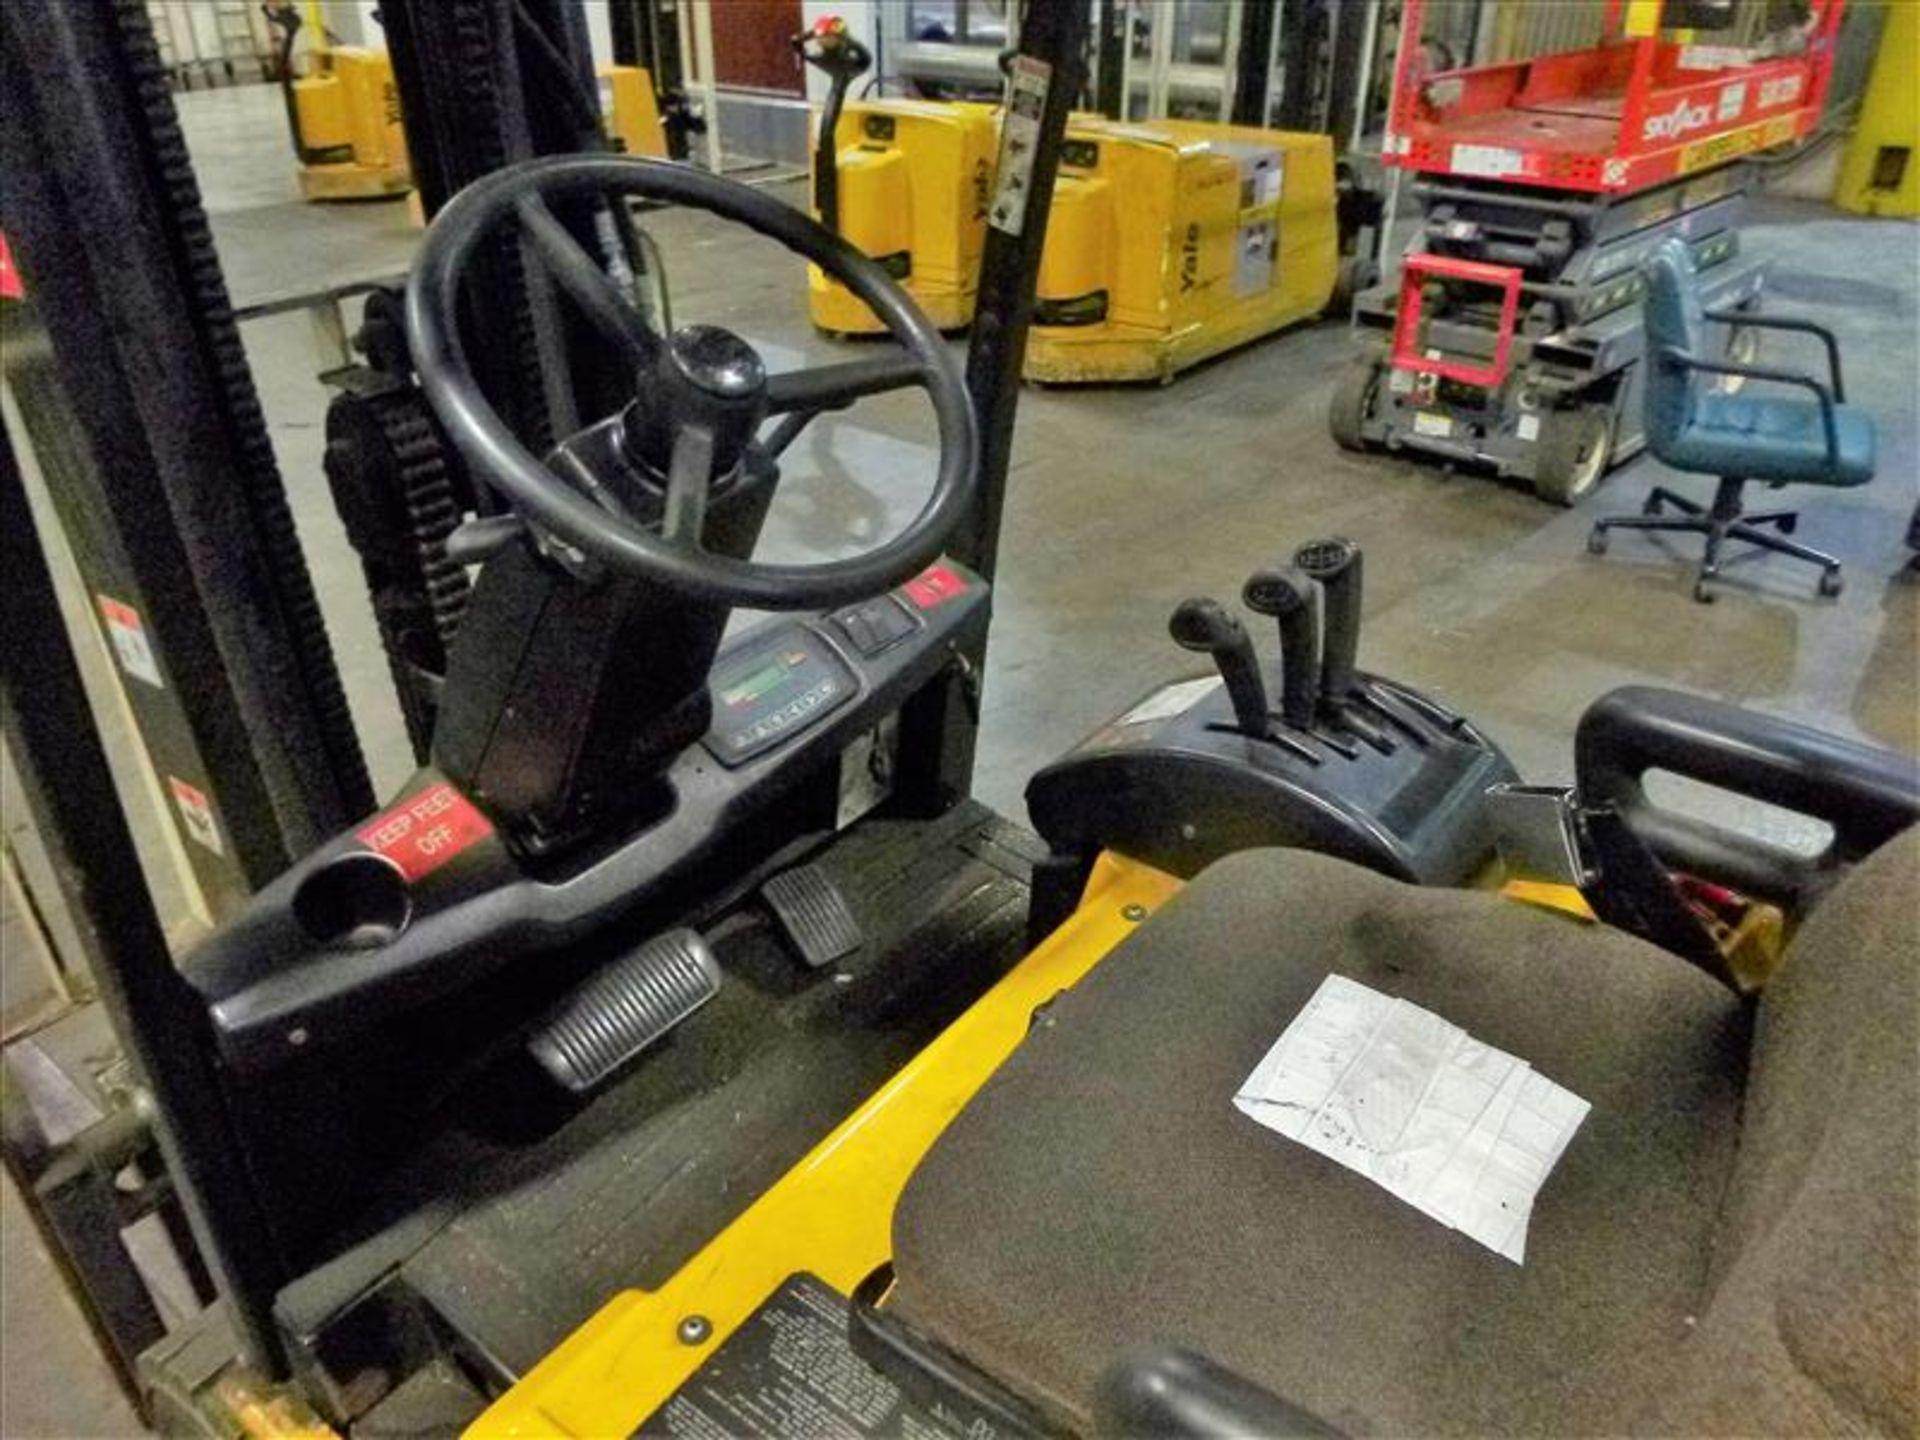 Yale fork lift truck, mod. ERP040VTHN48TE078, ser. no. F807N03990D, 48V electric, 3700 lbs cap., 175 - Image 3 of 4